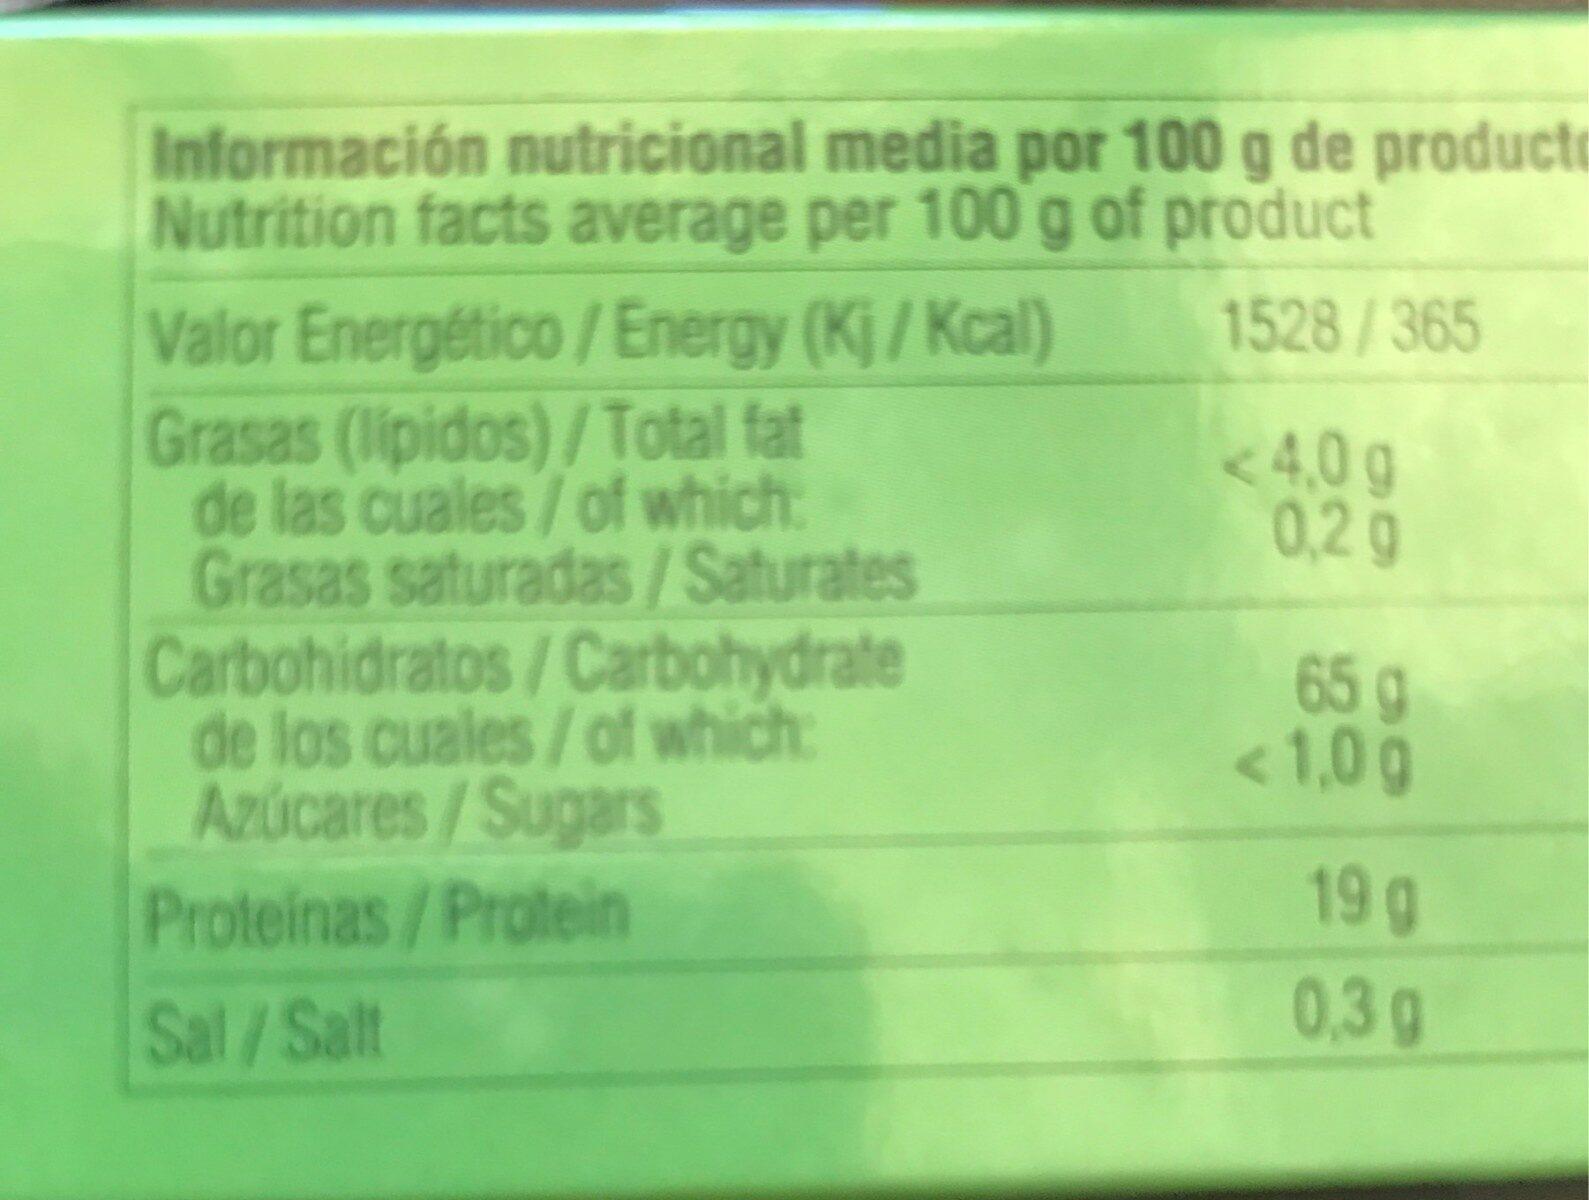 Menta Árabe - Nutrition facts